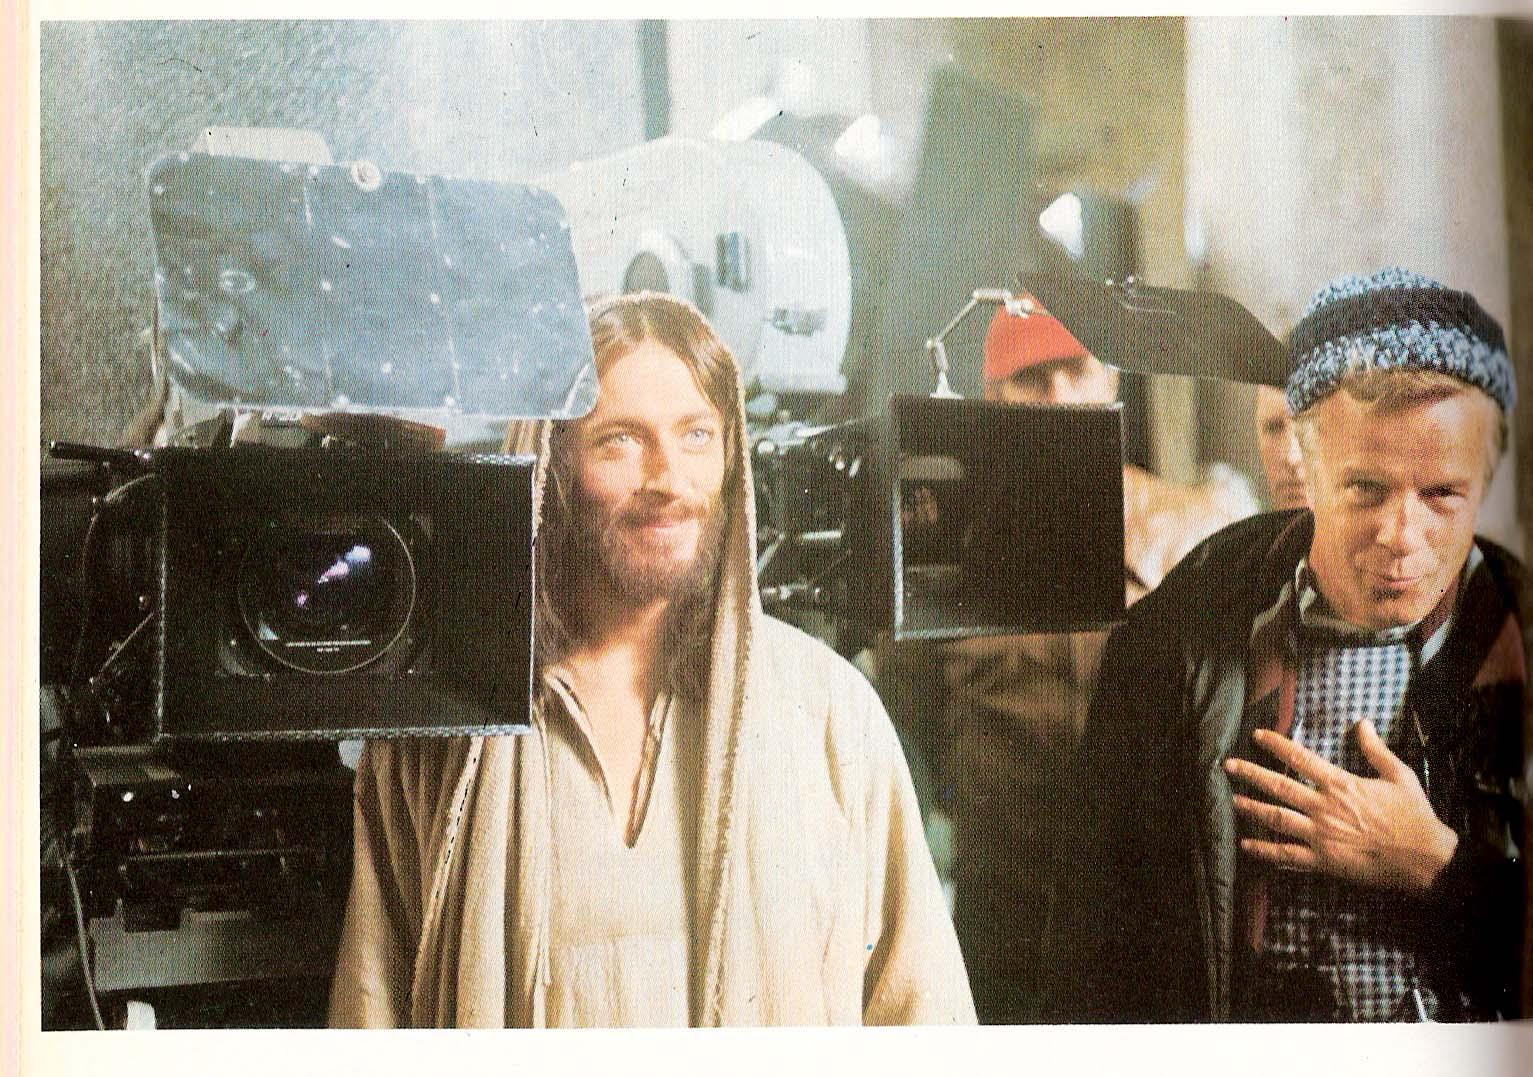 Jesus of Nazareth Behind the Scenes